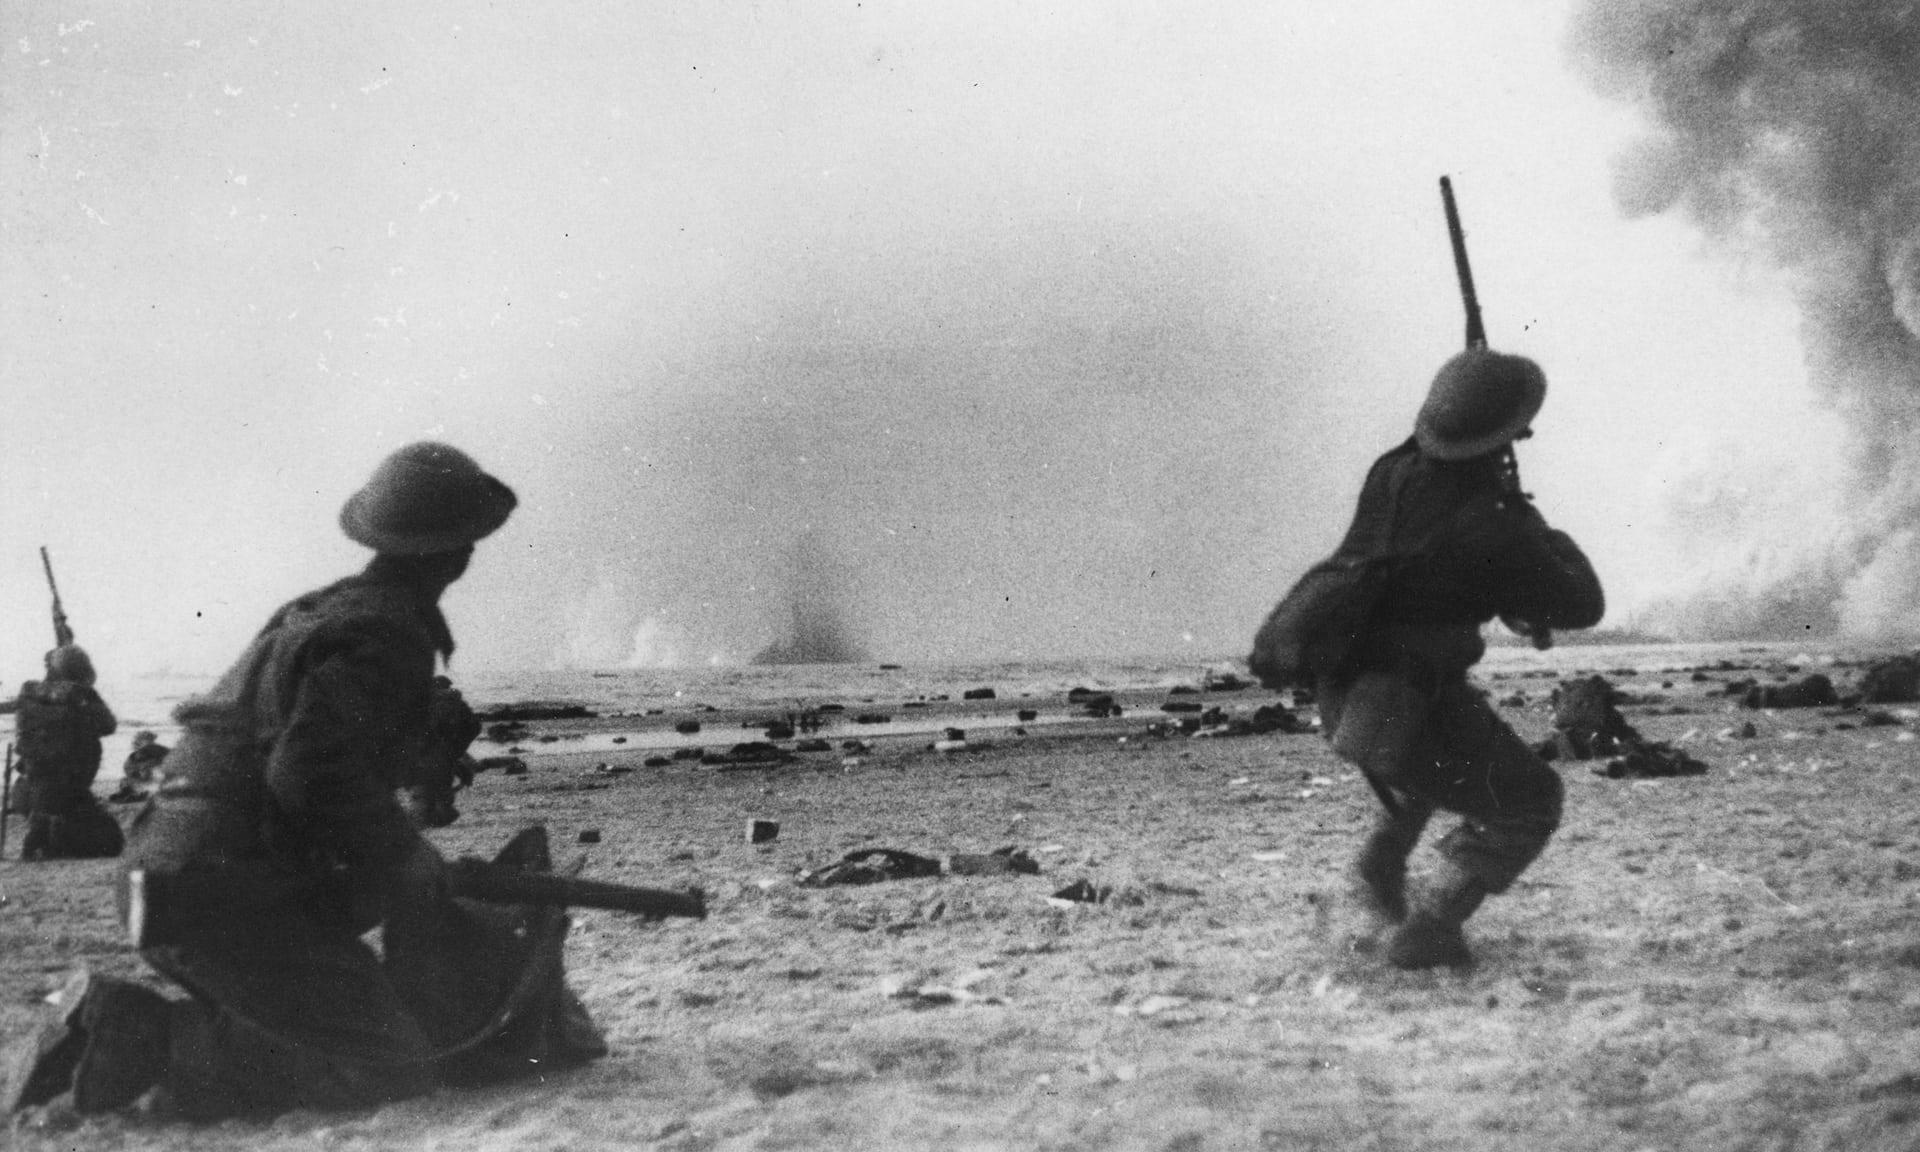 est100 一些攝影(some photos): Evacuation, Battle of Dunkirk. 撤退, 敦克爾克戰役/ 敦克爾克大撤退